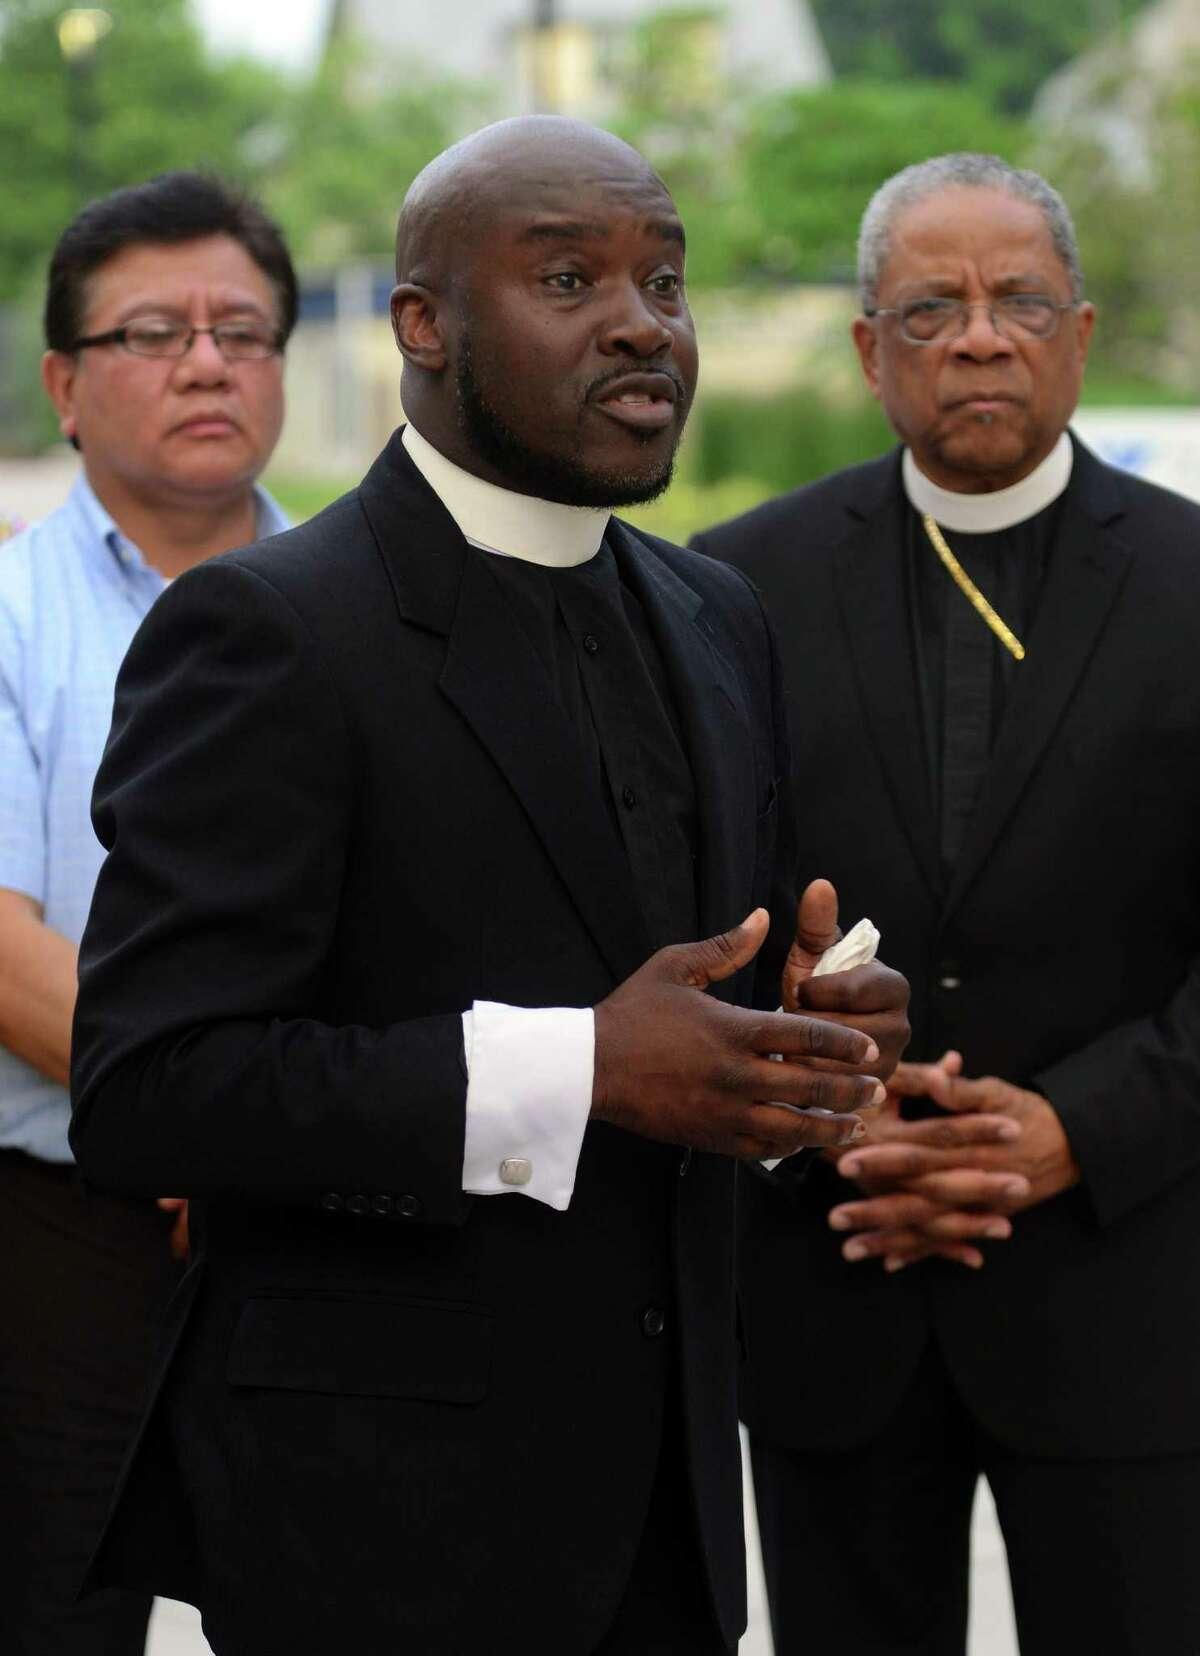 Bishop William Marshall at a vigil outside Bridgeport Hospital in Bridgeport, Conn., on Thursday June 11, 2015.